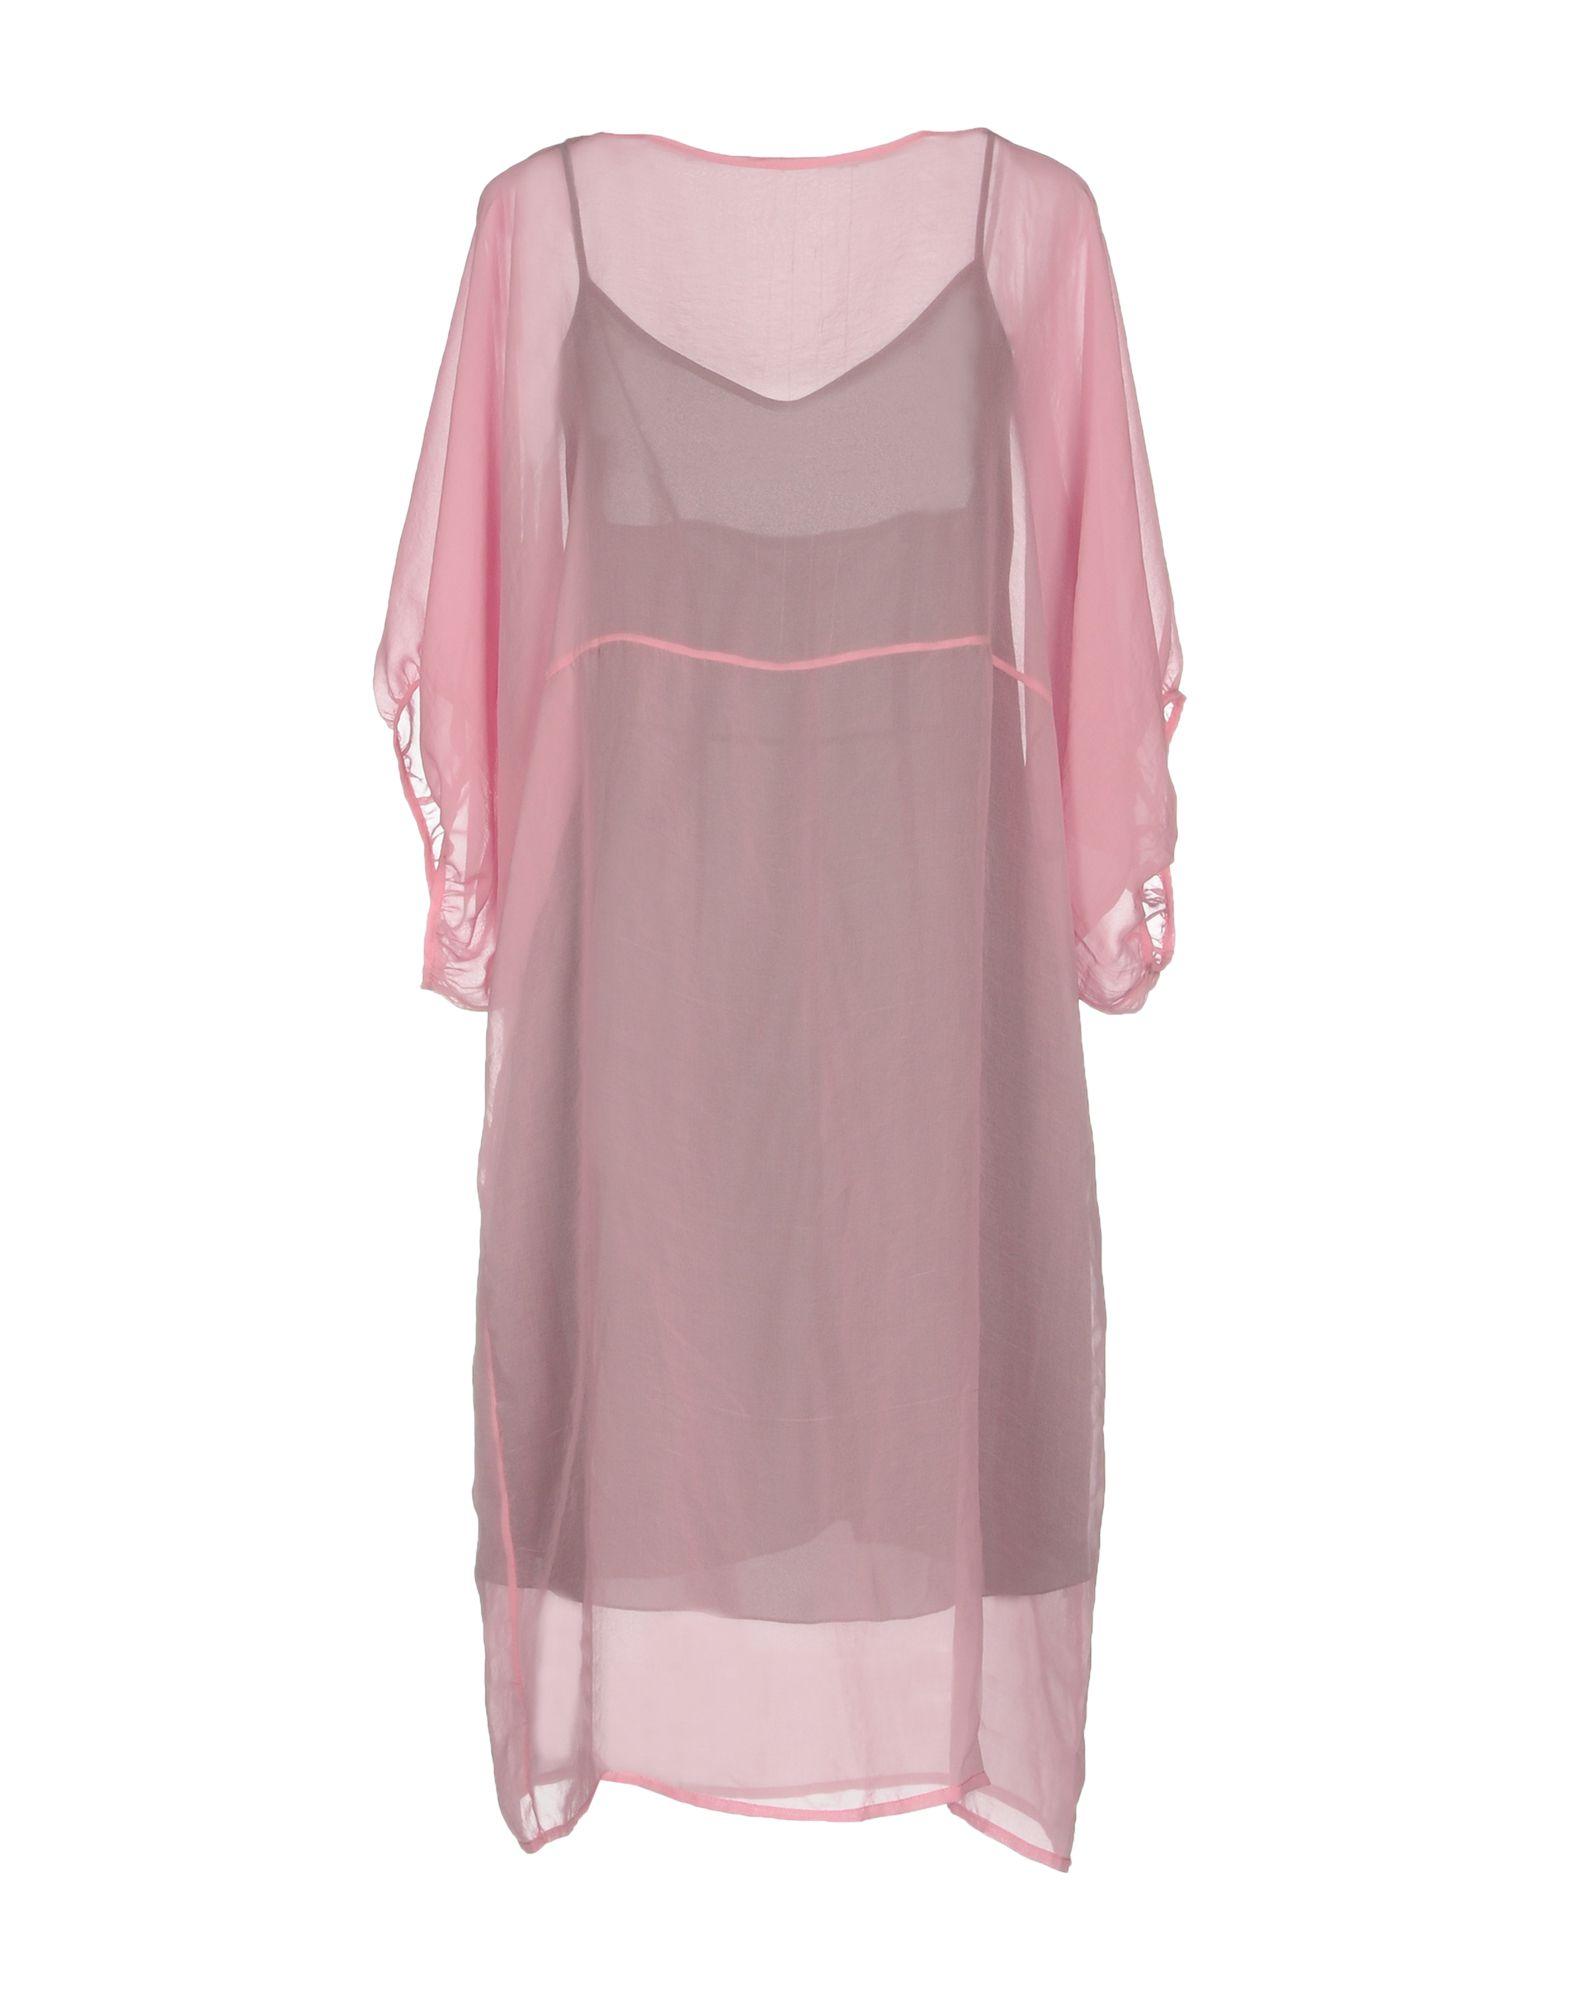 MAISON LAVINIATURRA Короткое платье maison laviniaturra платье до колена